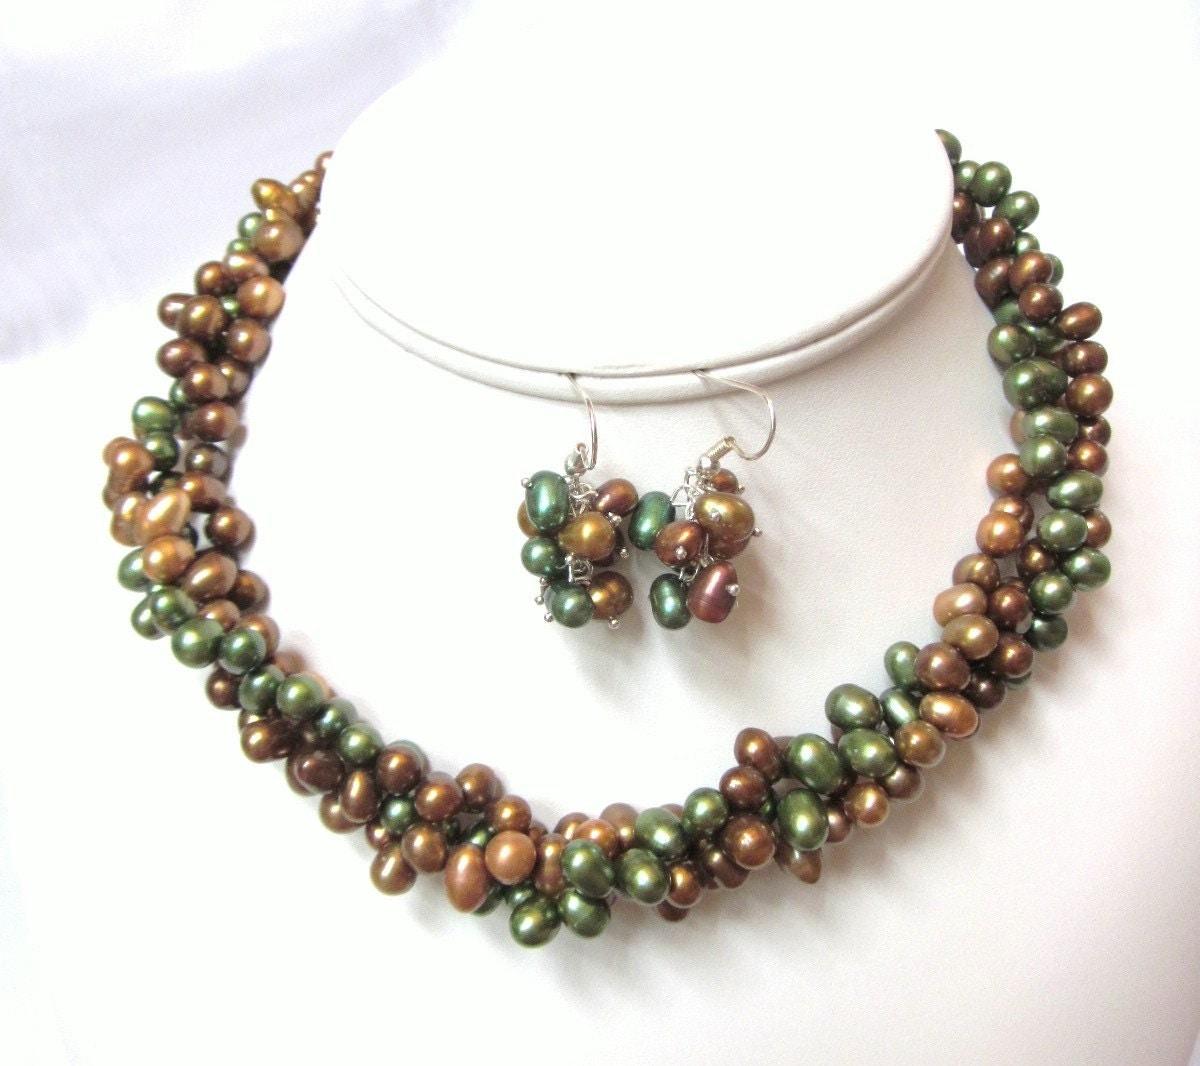 Torsade Necklace: Pearl Torsade Necklace Dark Green And Shades Of Brown Fresh